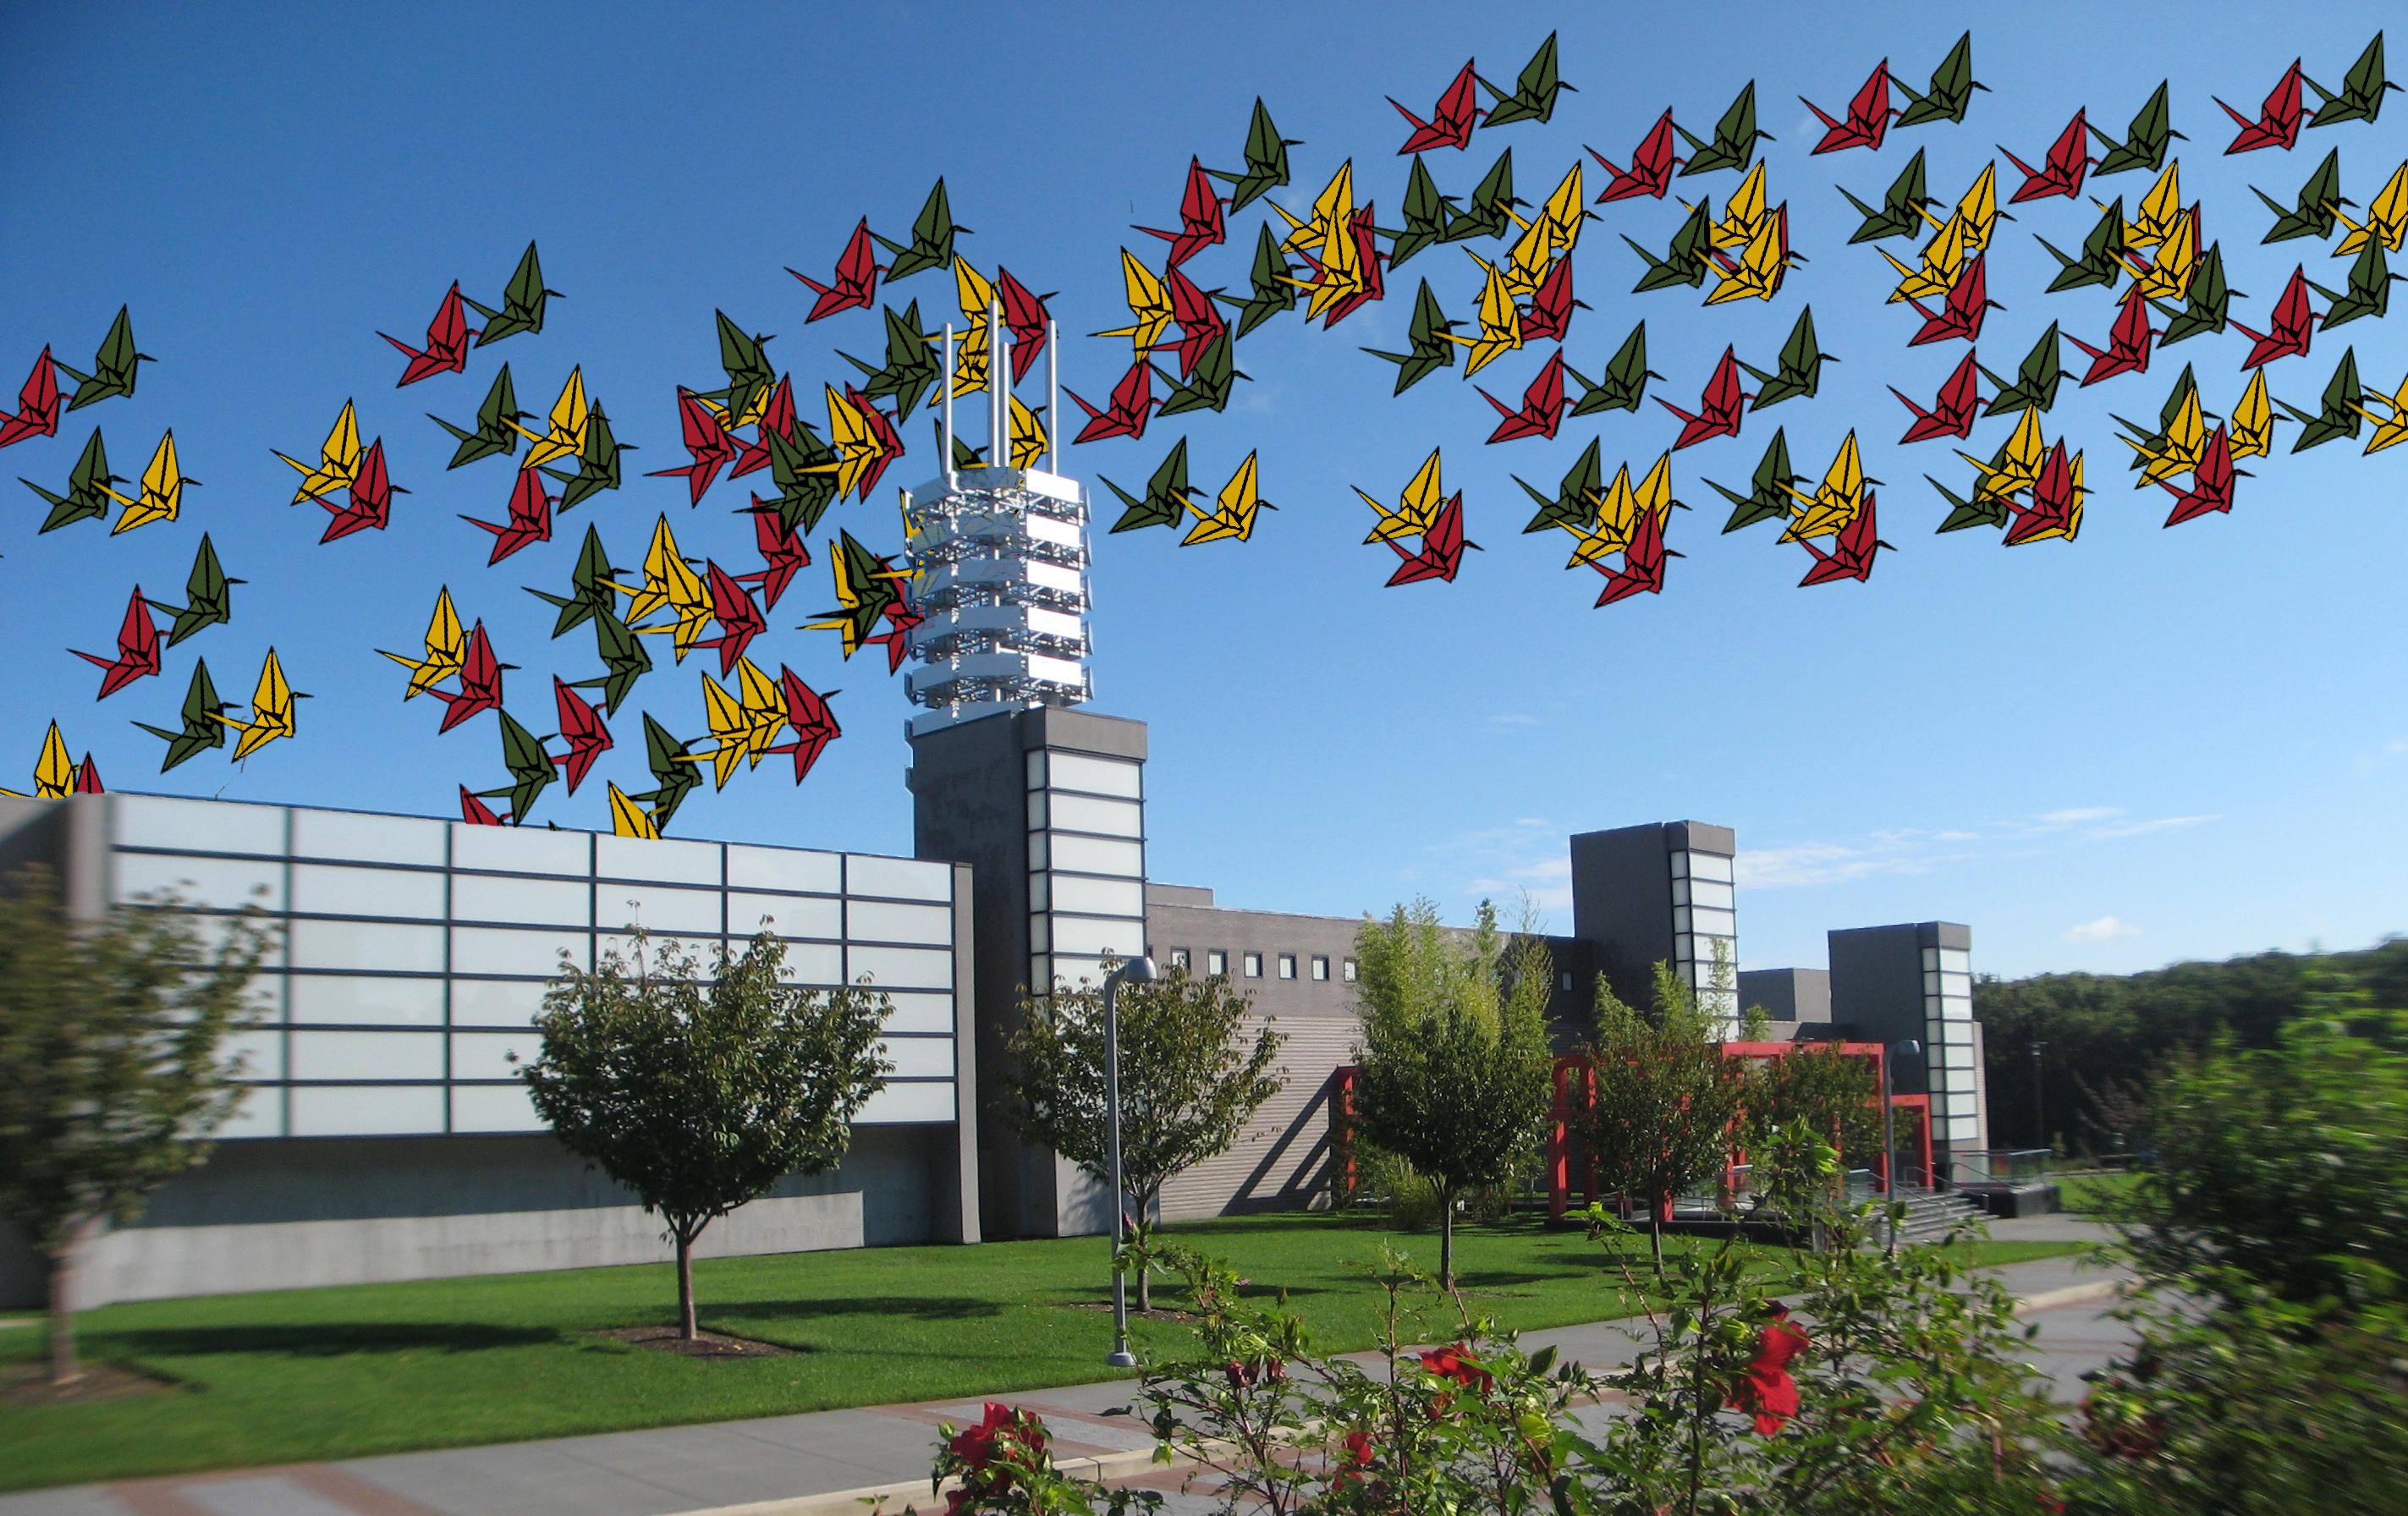 Origamiheaven 1